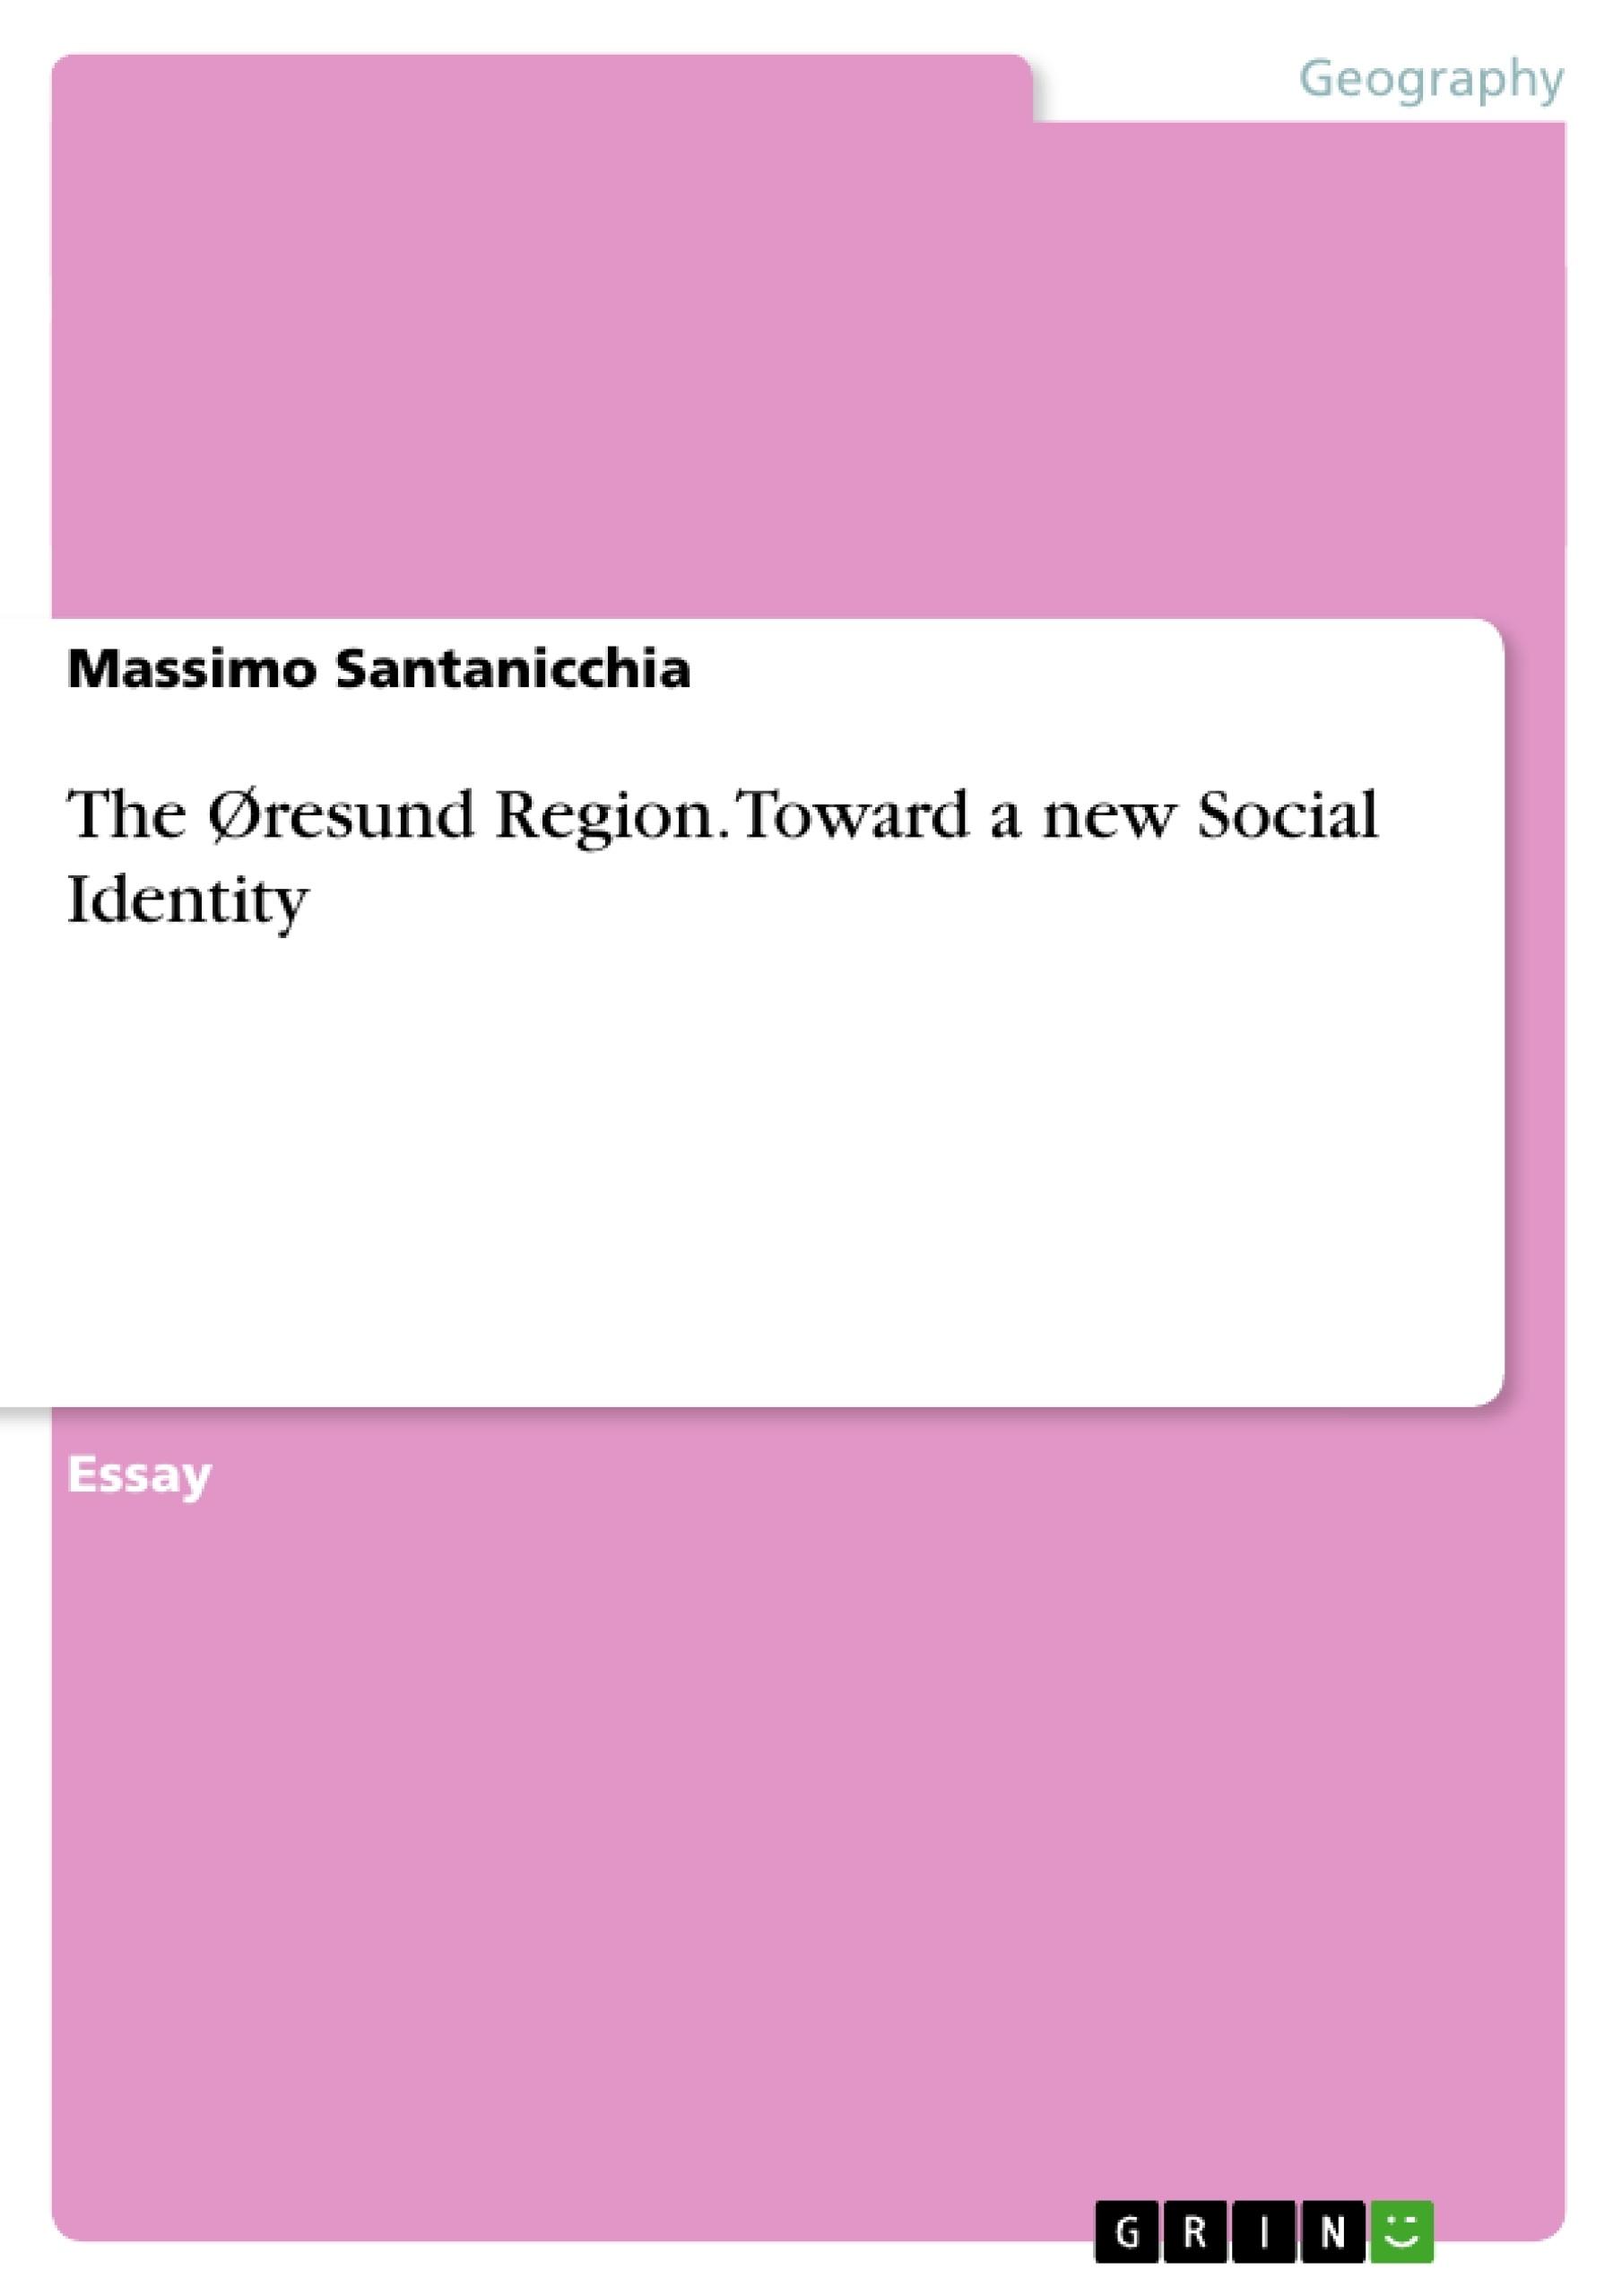 Title: The Øresund Region. Toward a new Social Identity